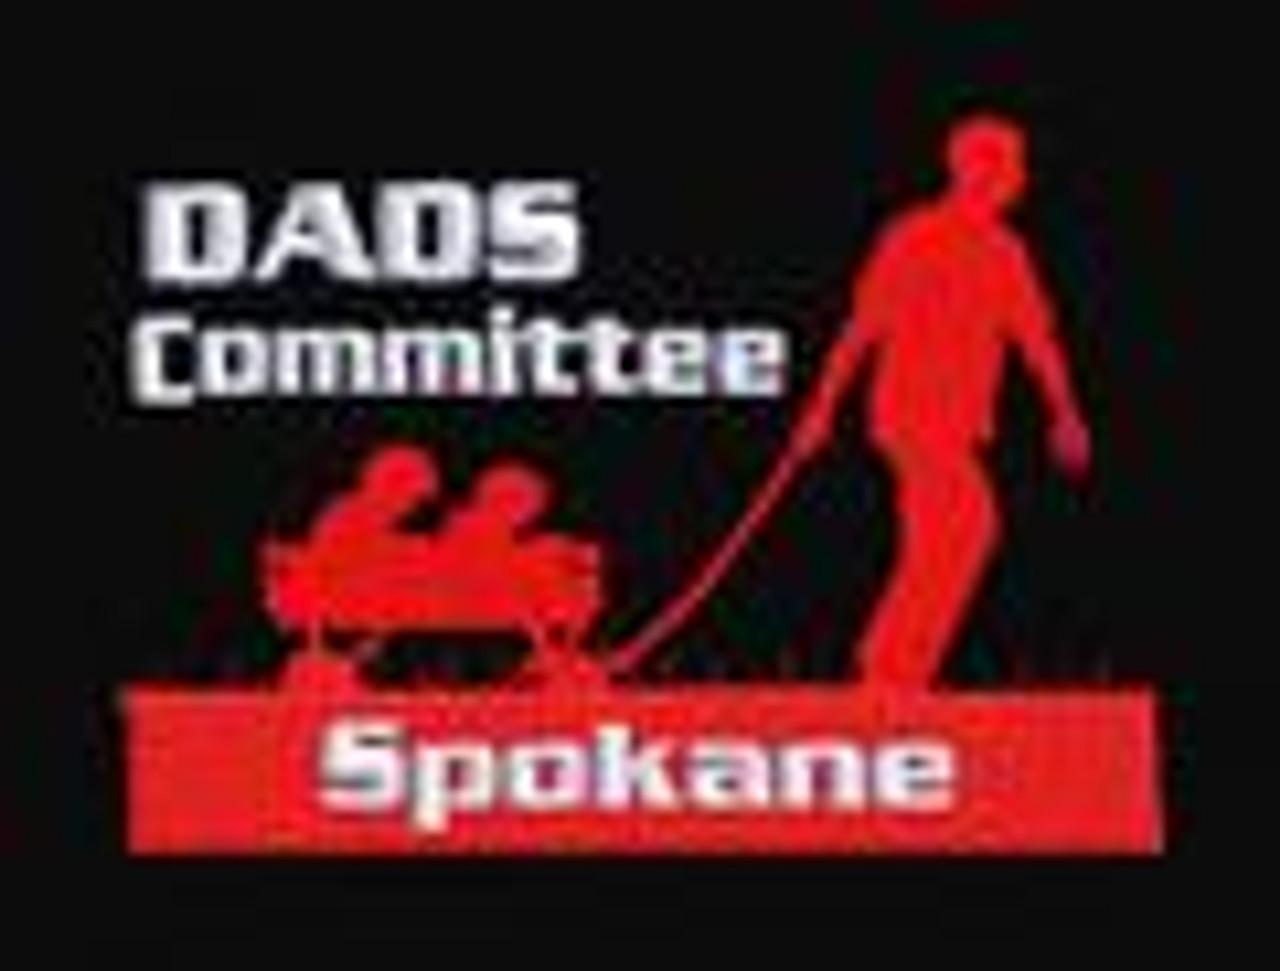 Dad's Committee of Spokane